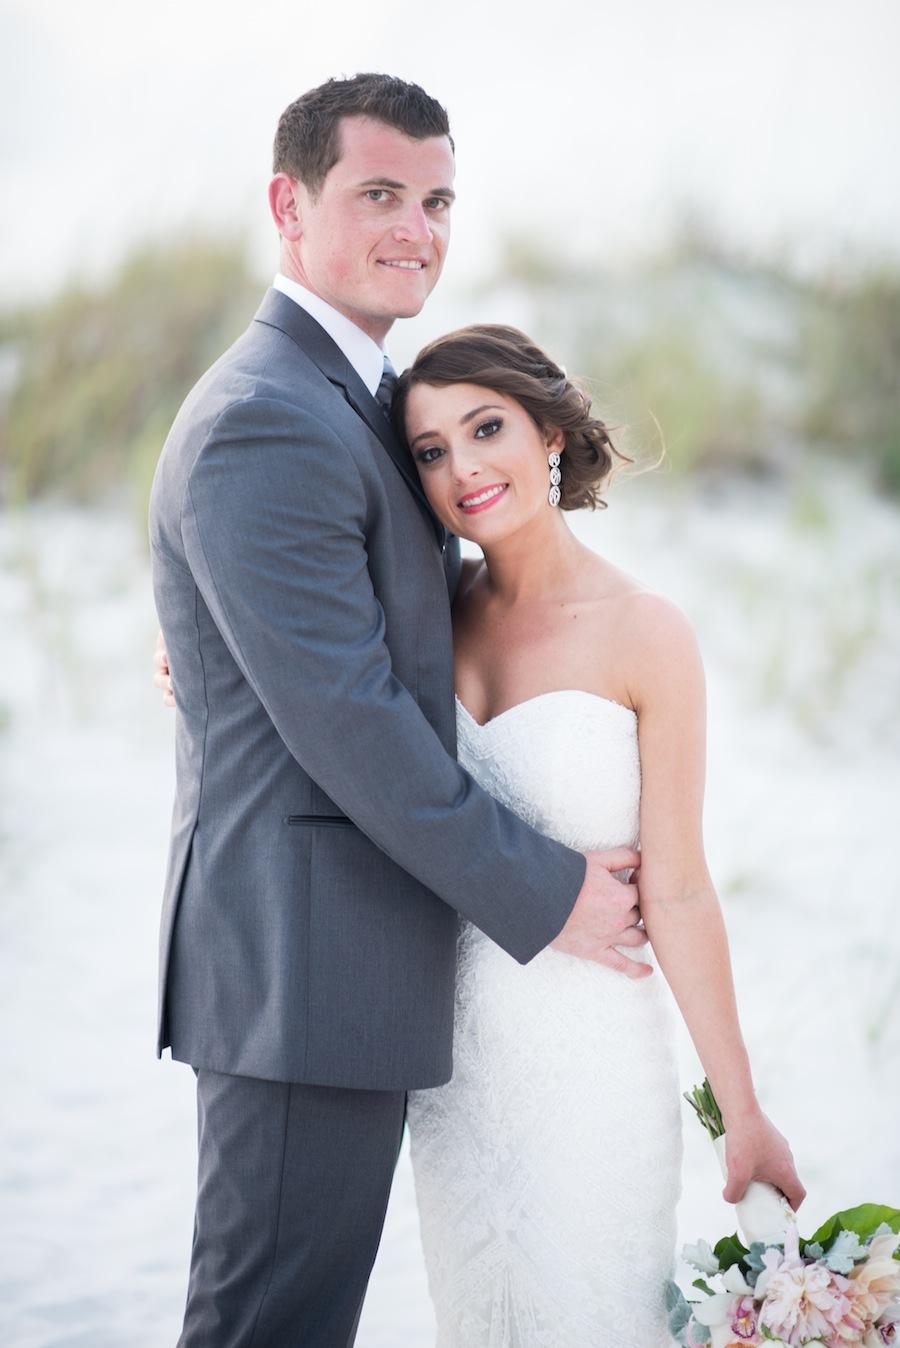 Beach Bride and Groom Wedding Portrait